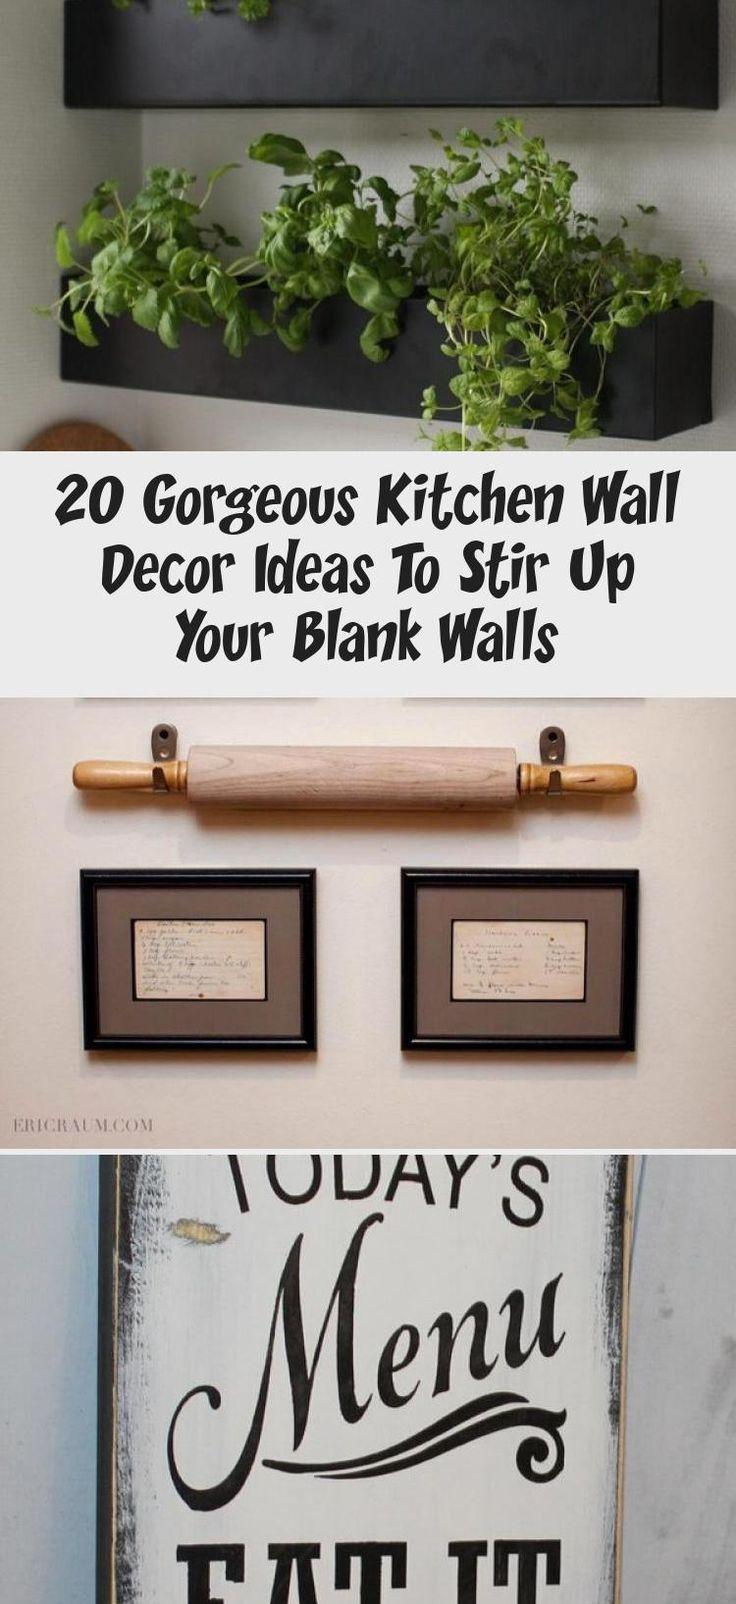 20 gorgeous kitchen wall decor ideas to stir up your blank walls in 2020 kitchen wall decor on kitchen decor wall ideas id=72144